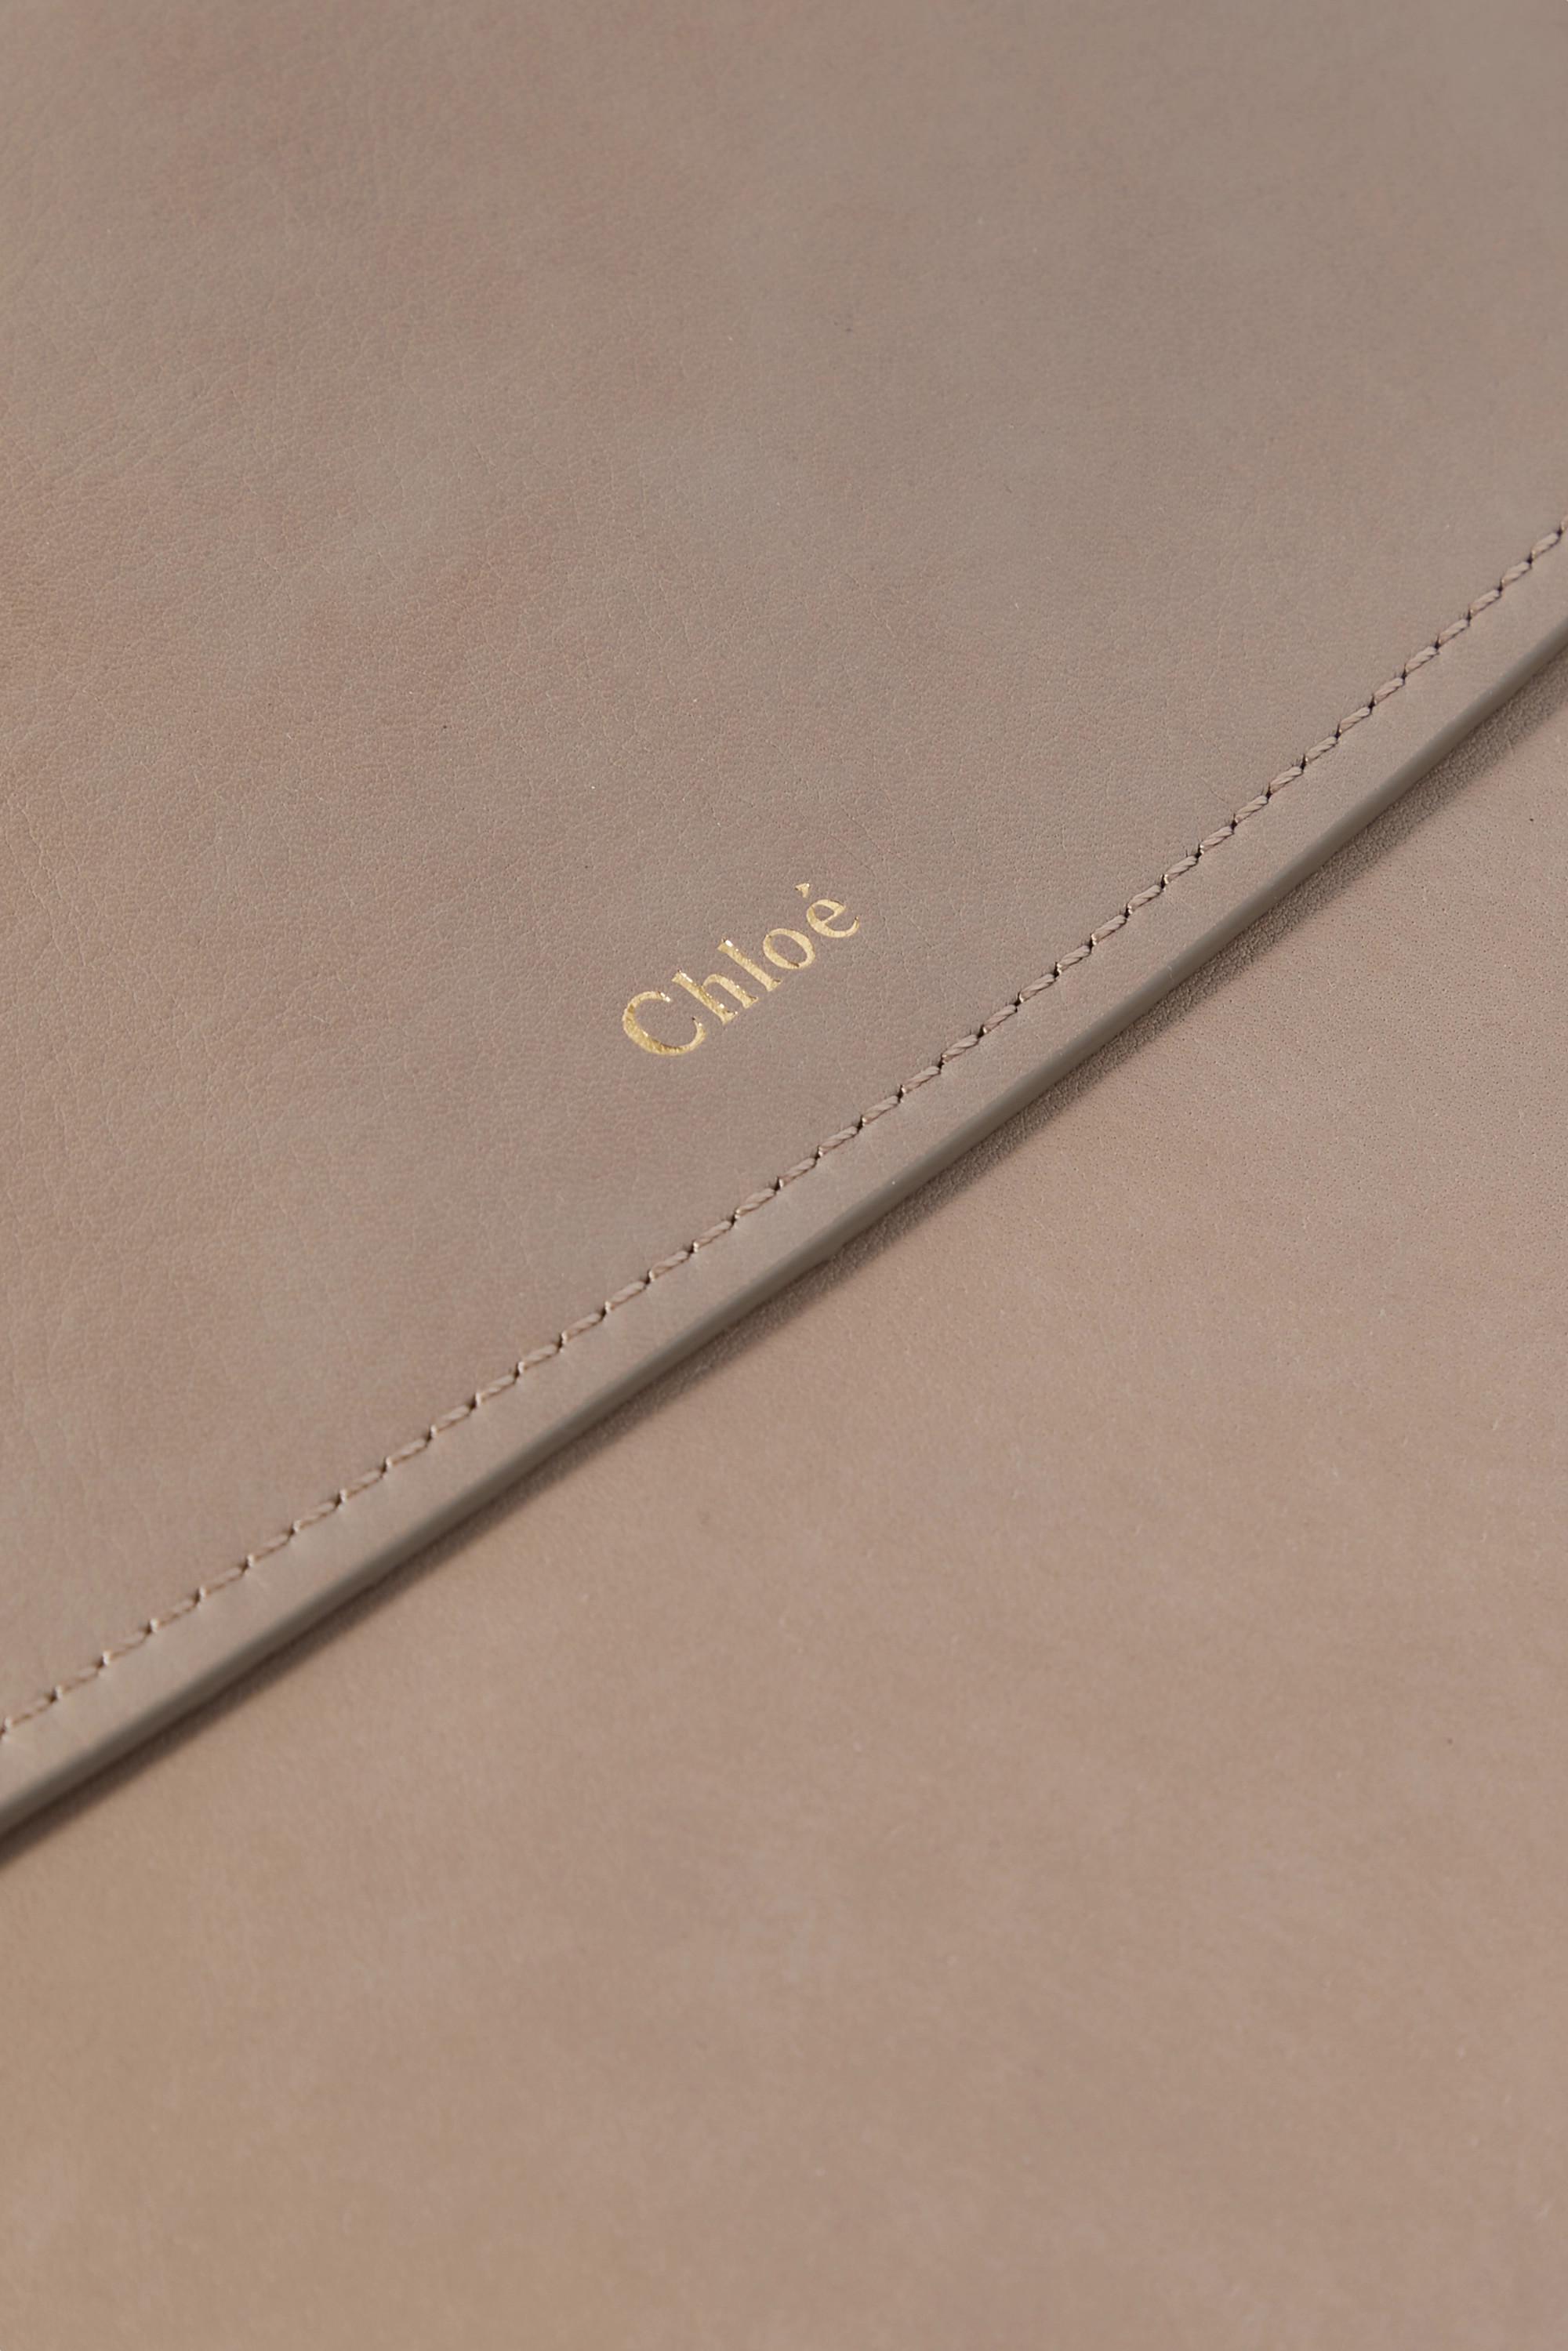 Chloé Kiss leather shoulder bag